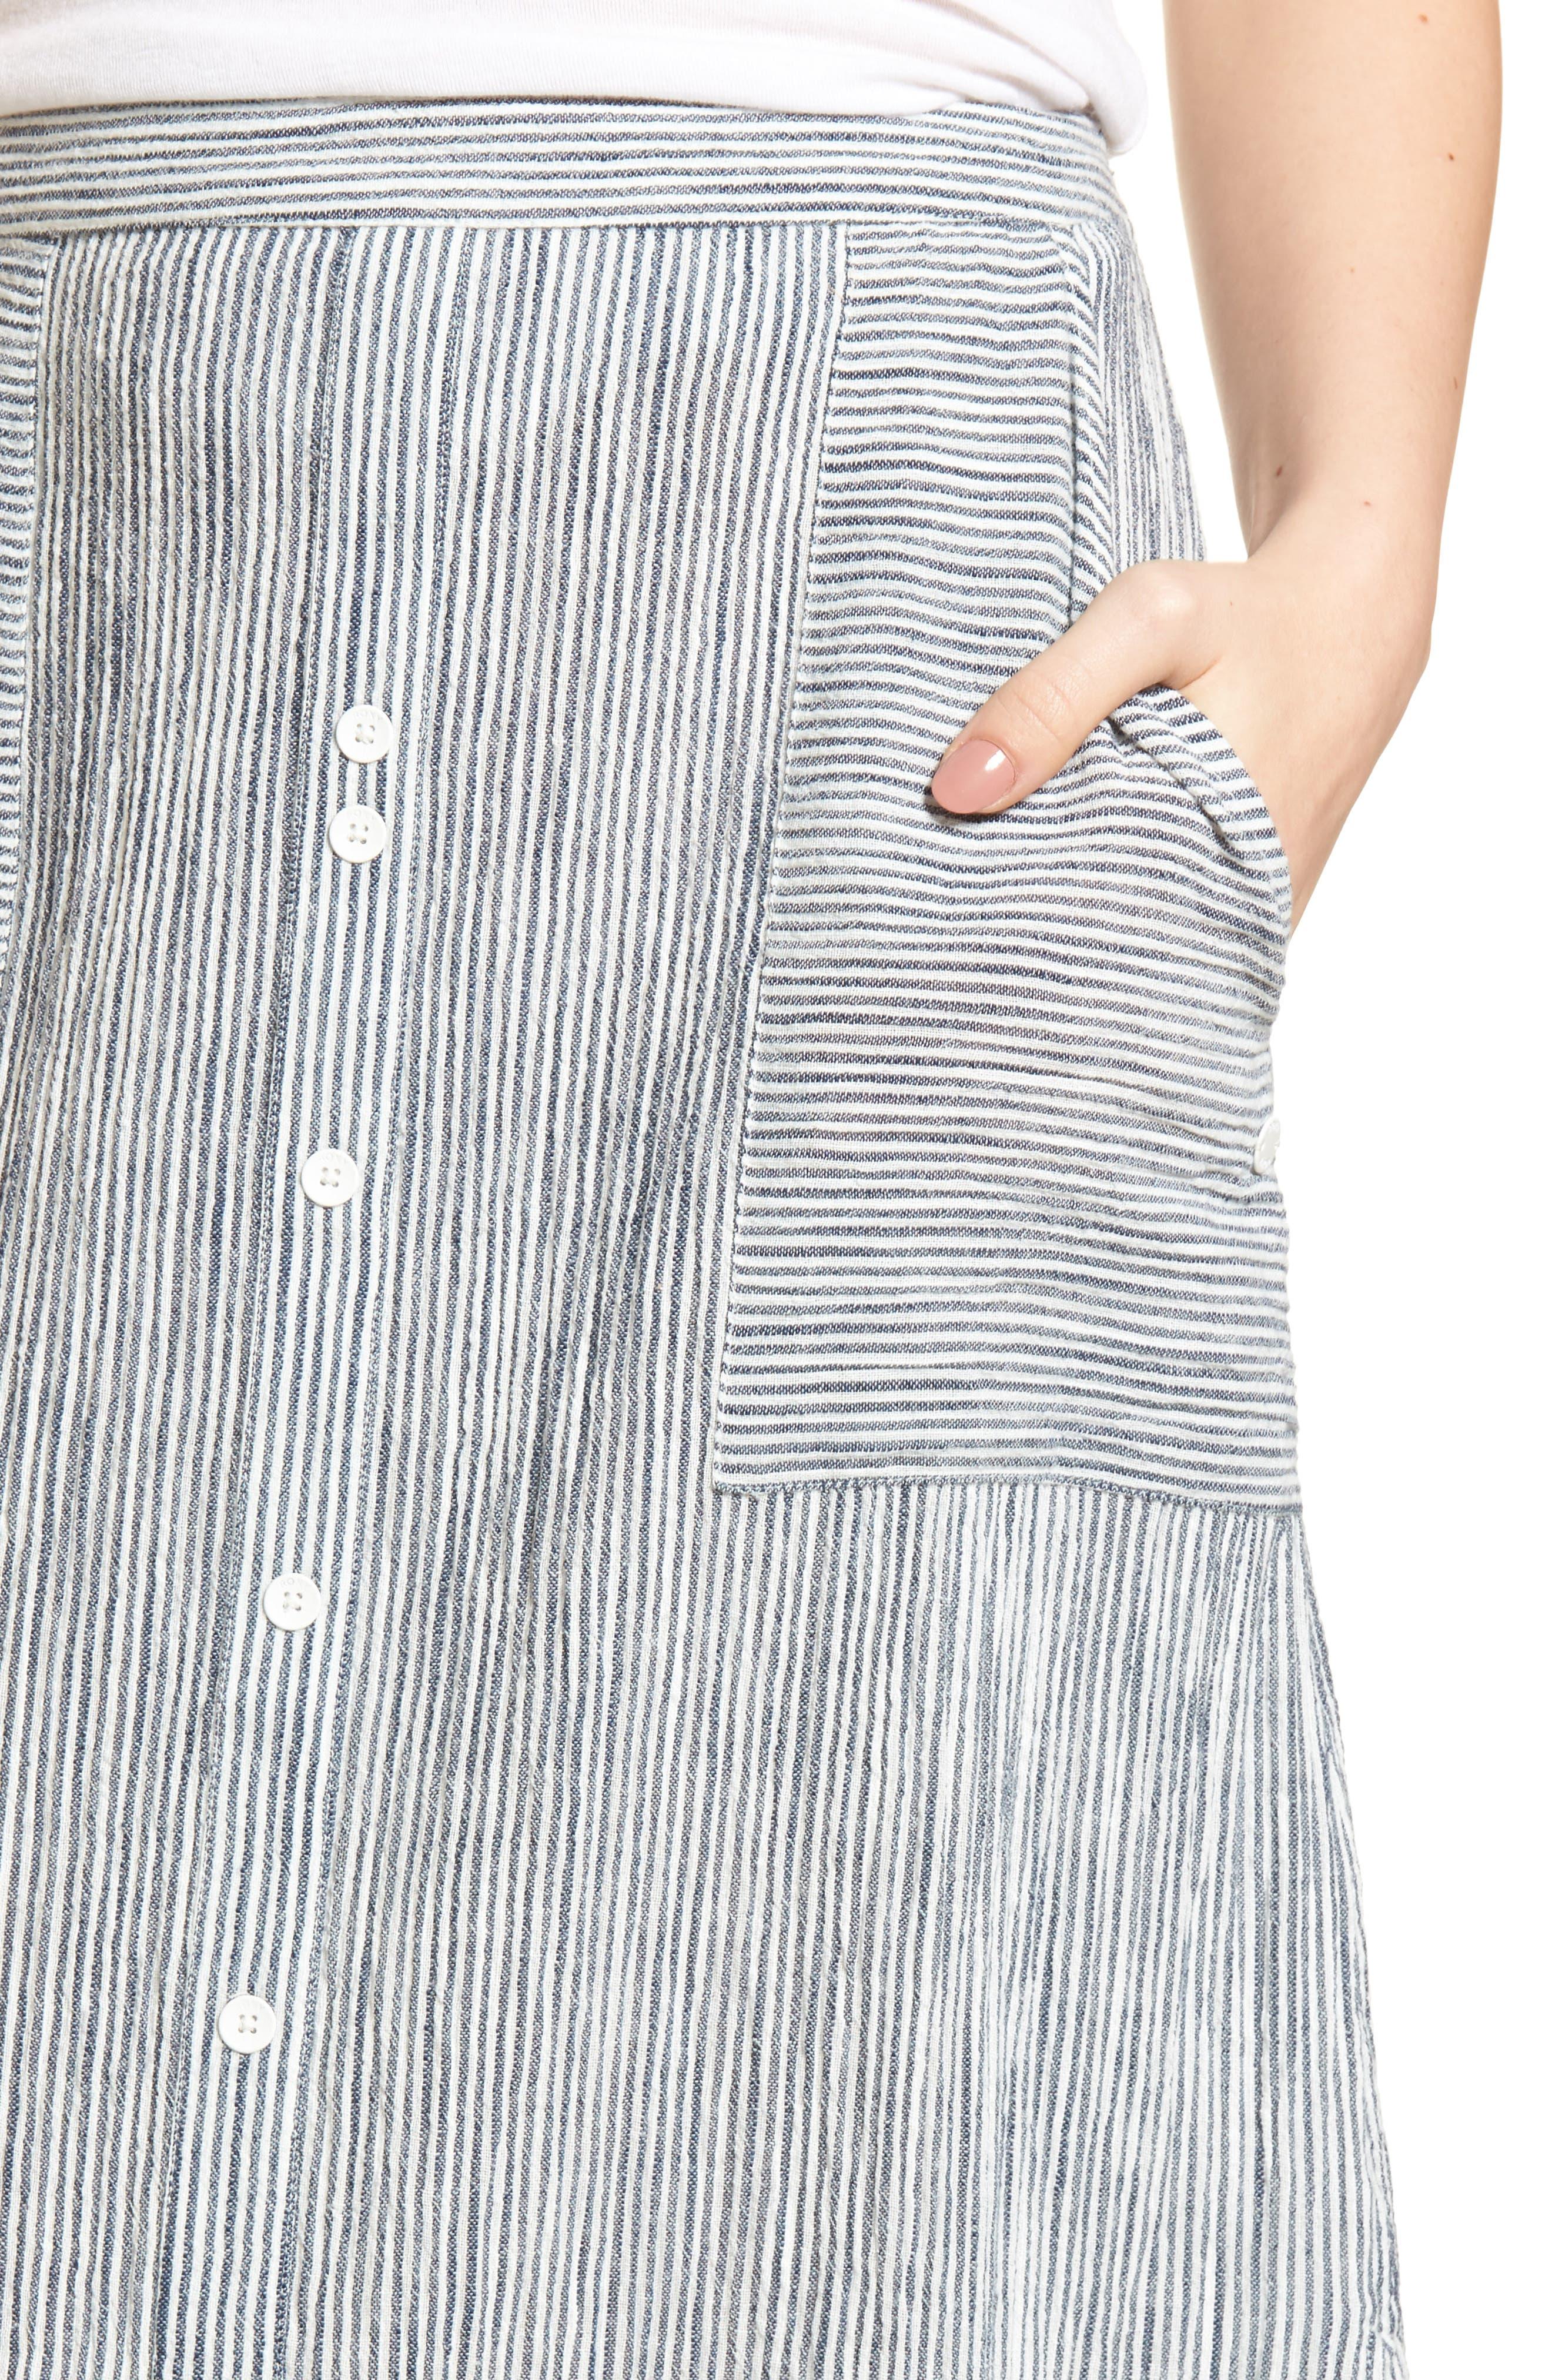 Sunset Islands Pinstripe Maxi Skirt,                             Alternate thumbnail 4, color,